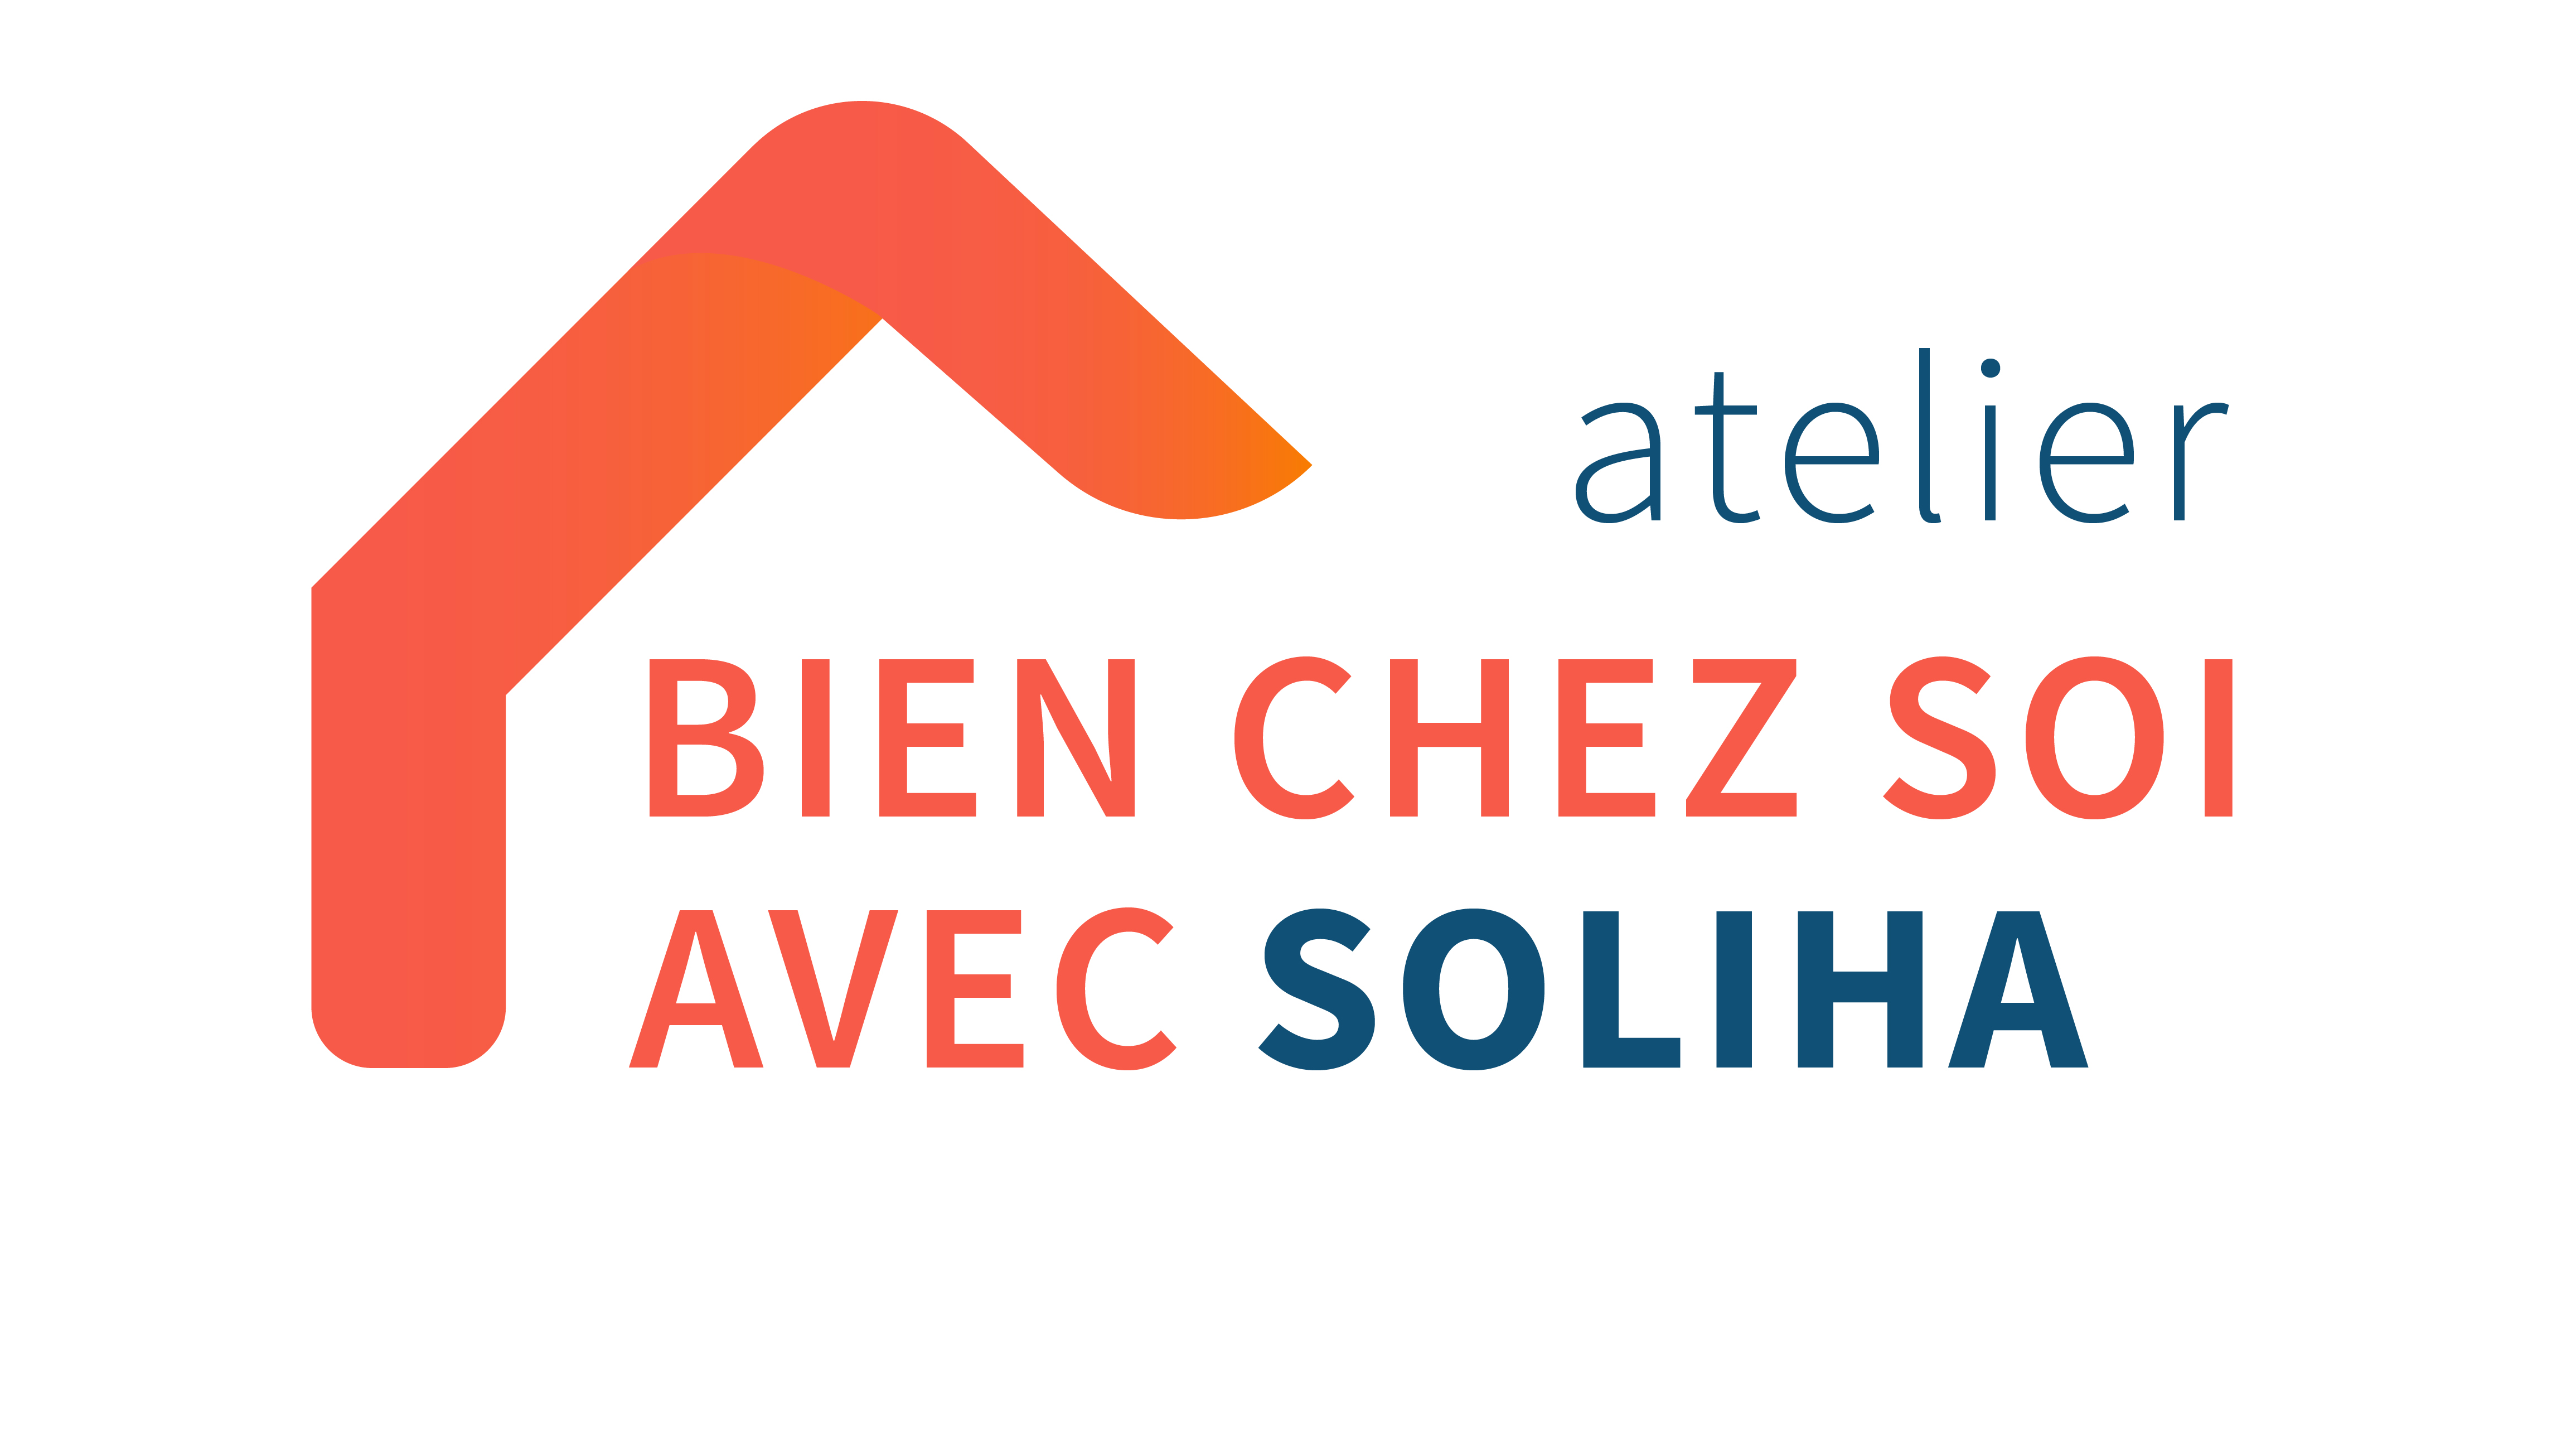 Logo Bien chez soi avec SOLIHA